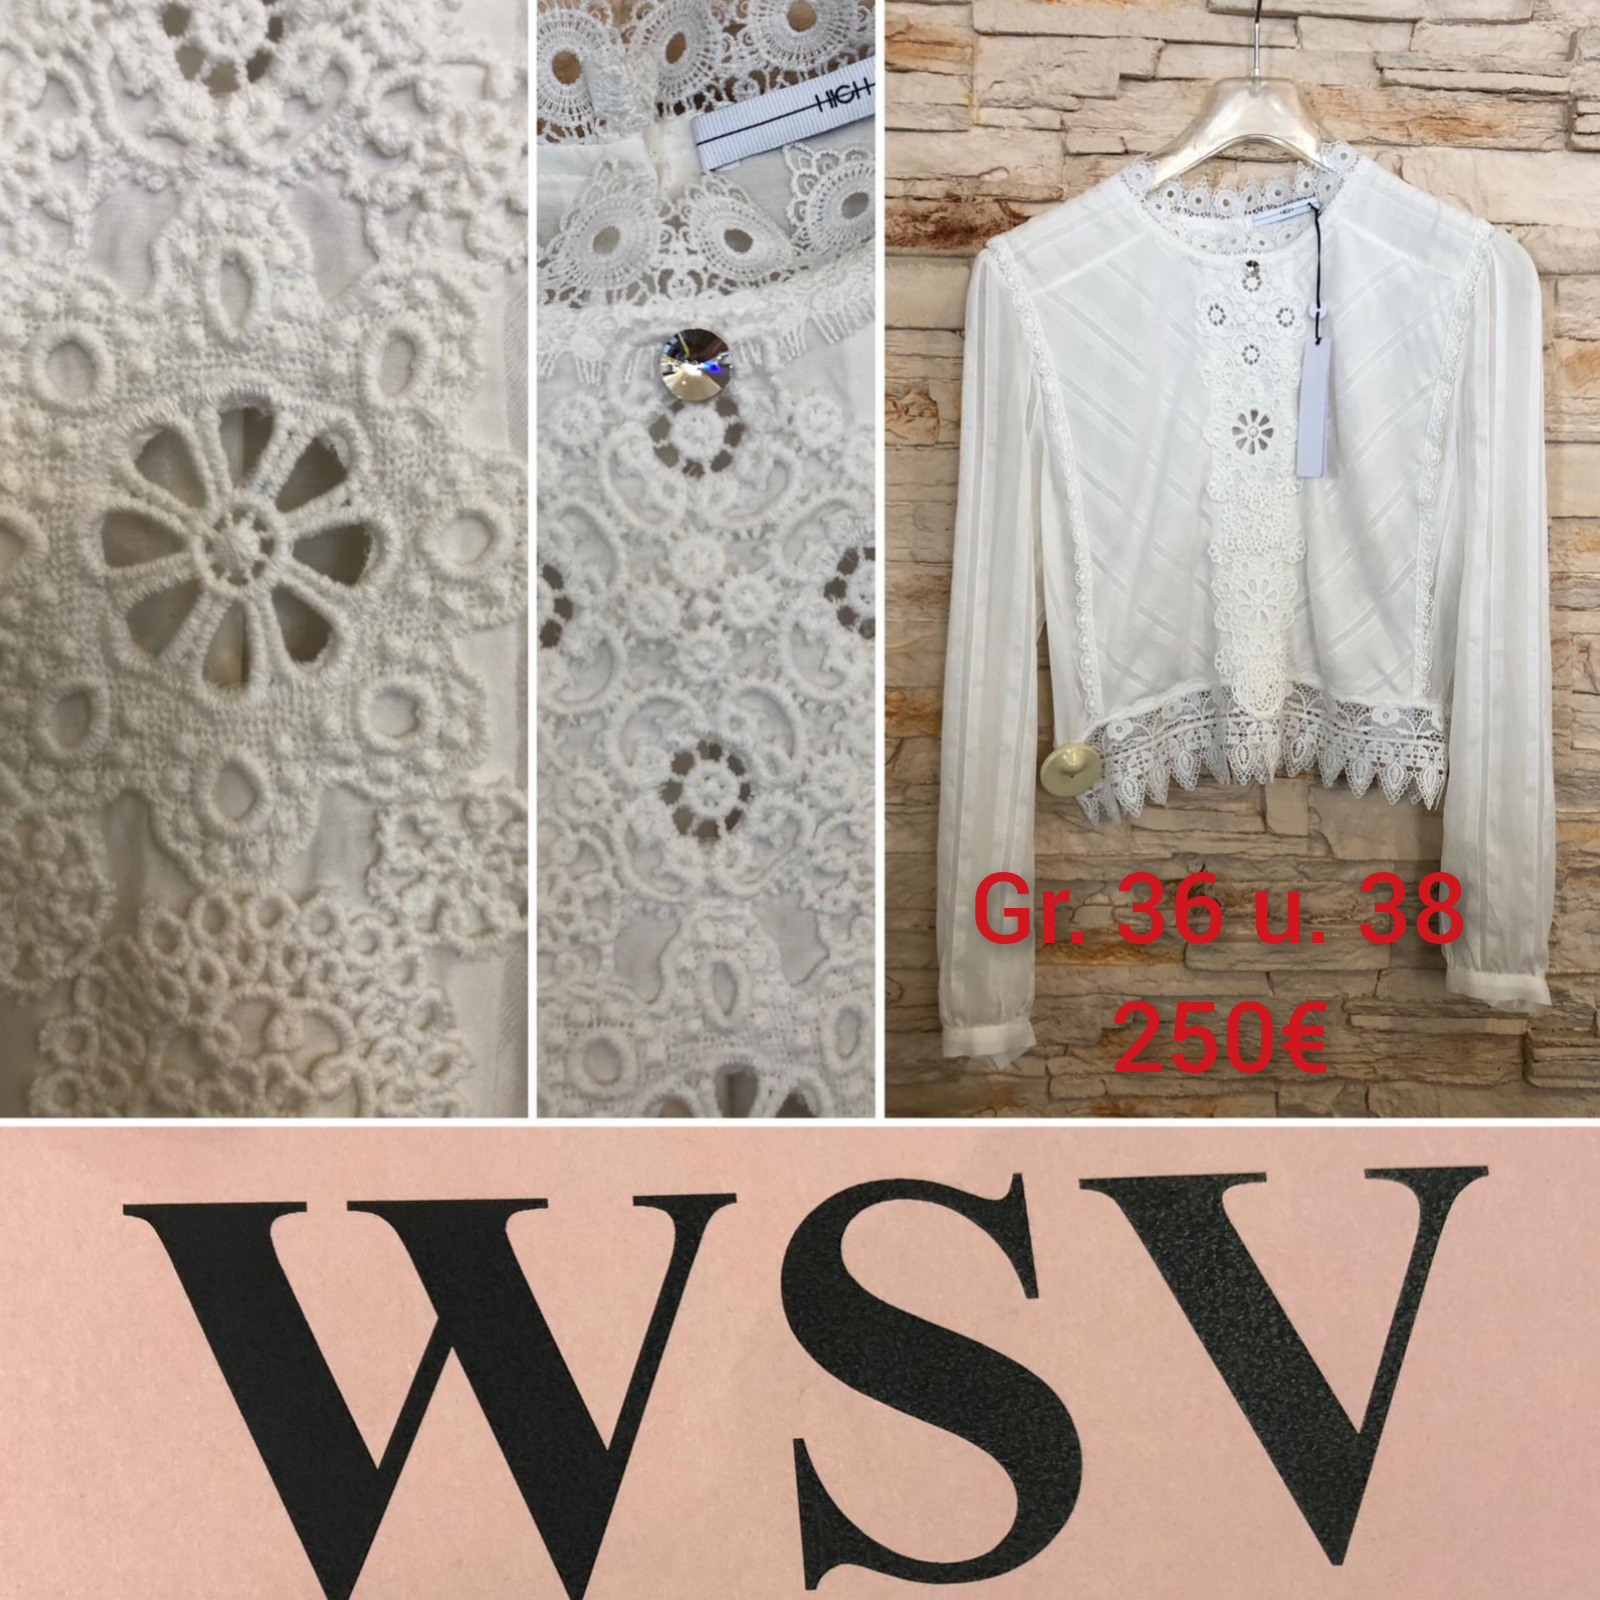 High Bluse WSV